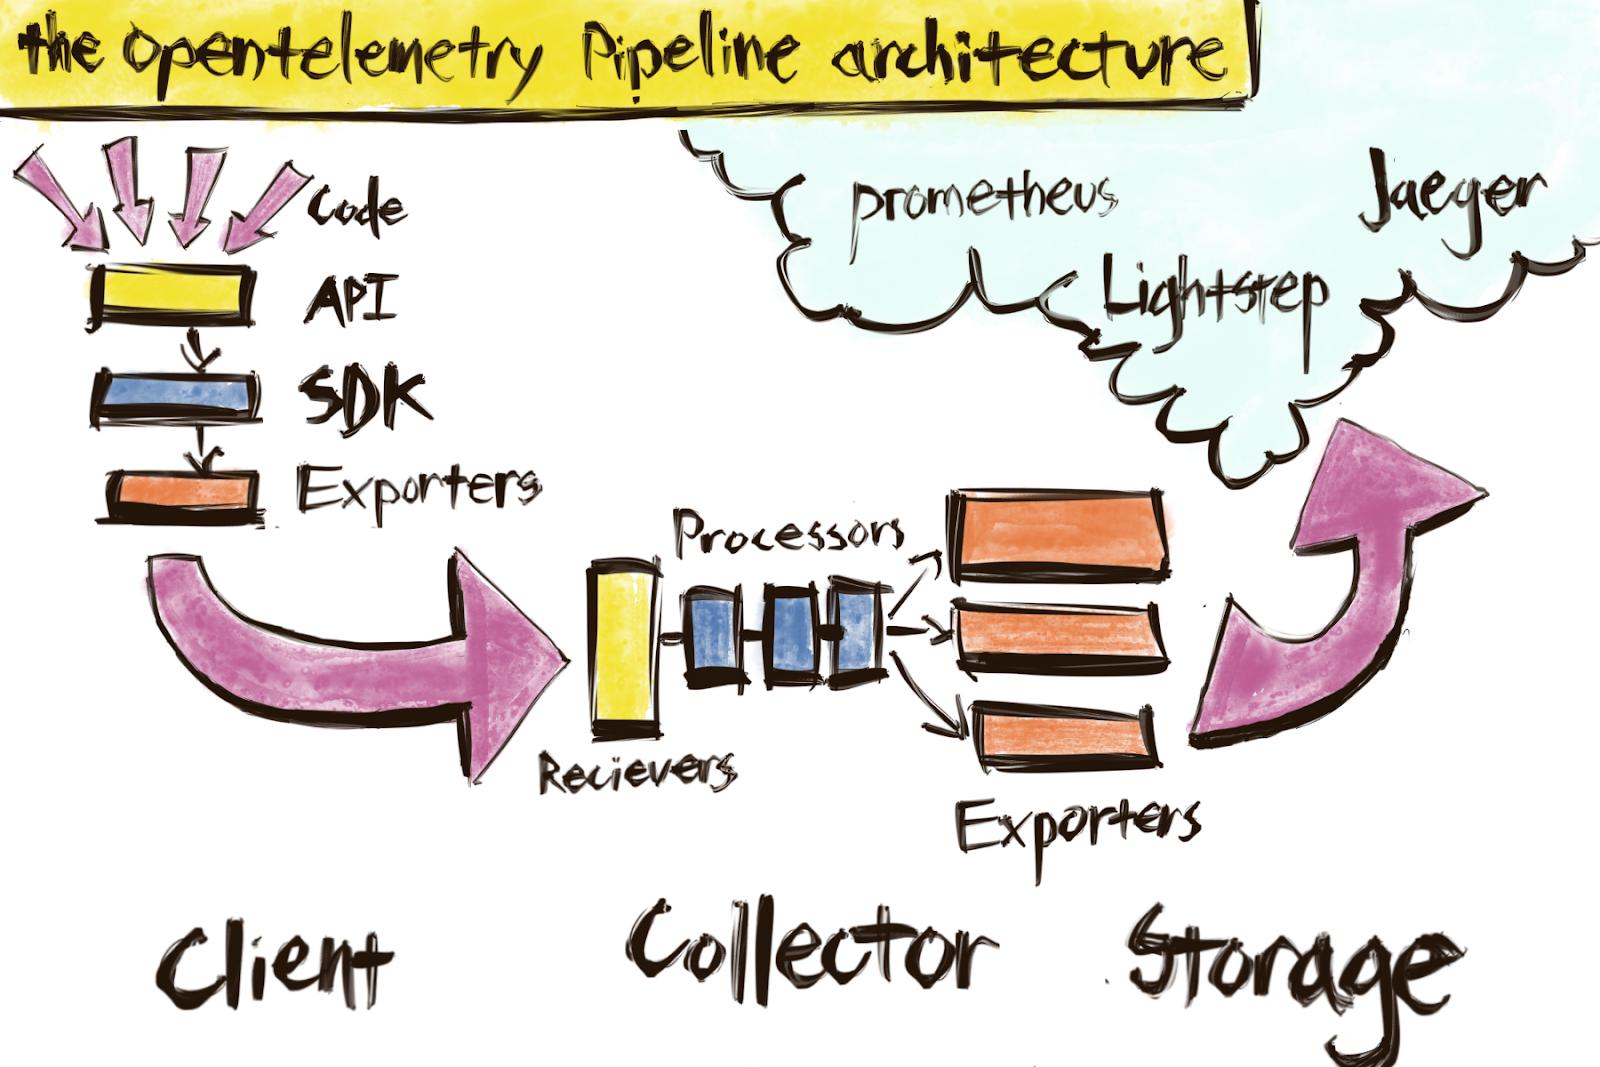 OpenTelemetry Pipeline Architecture